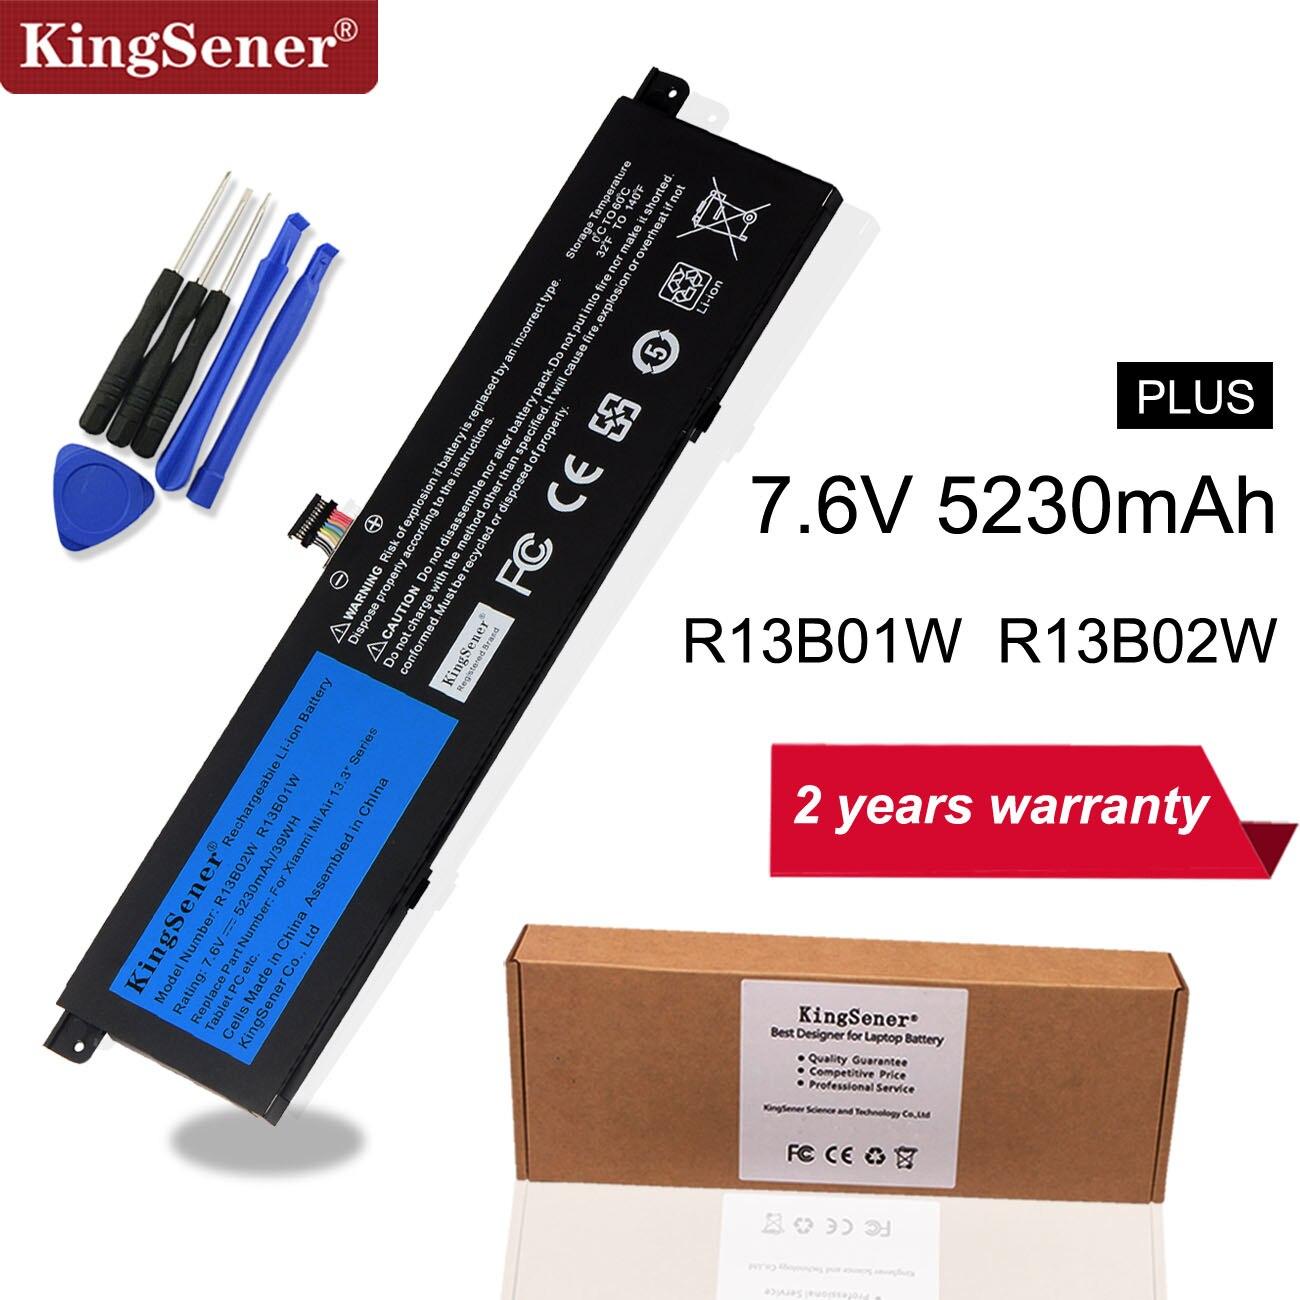 Kingsener 7,6 V 5230mAh nuevo R13B01W R13B02W batería del ordenador portátil para Xiaomi mi Air 13,3 Serie Tablet PC 39WH